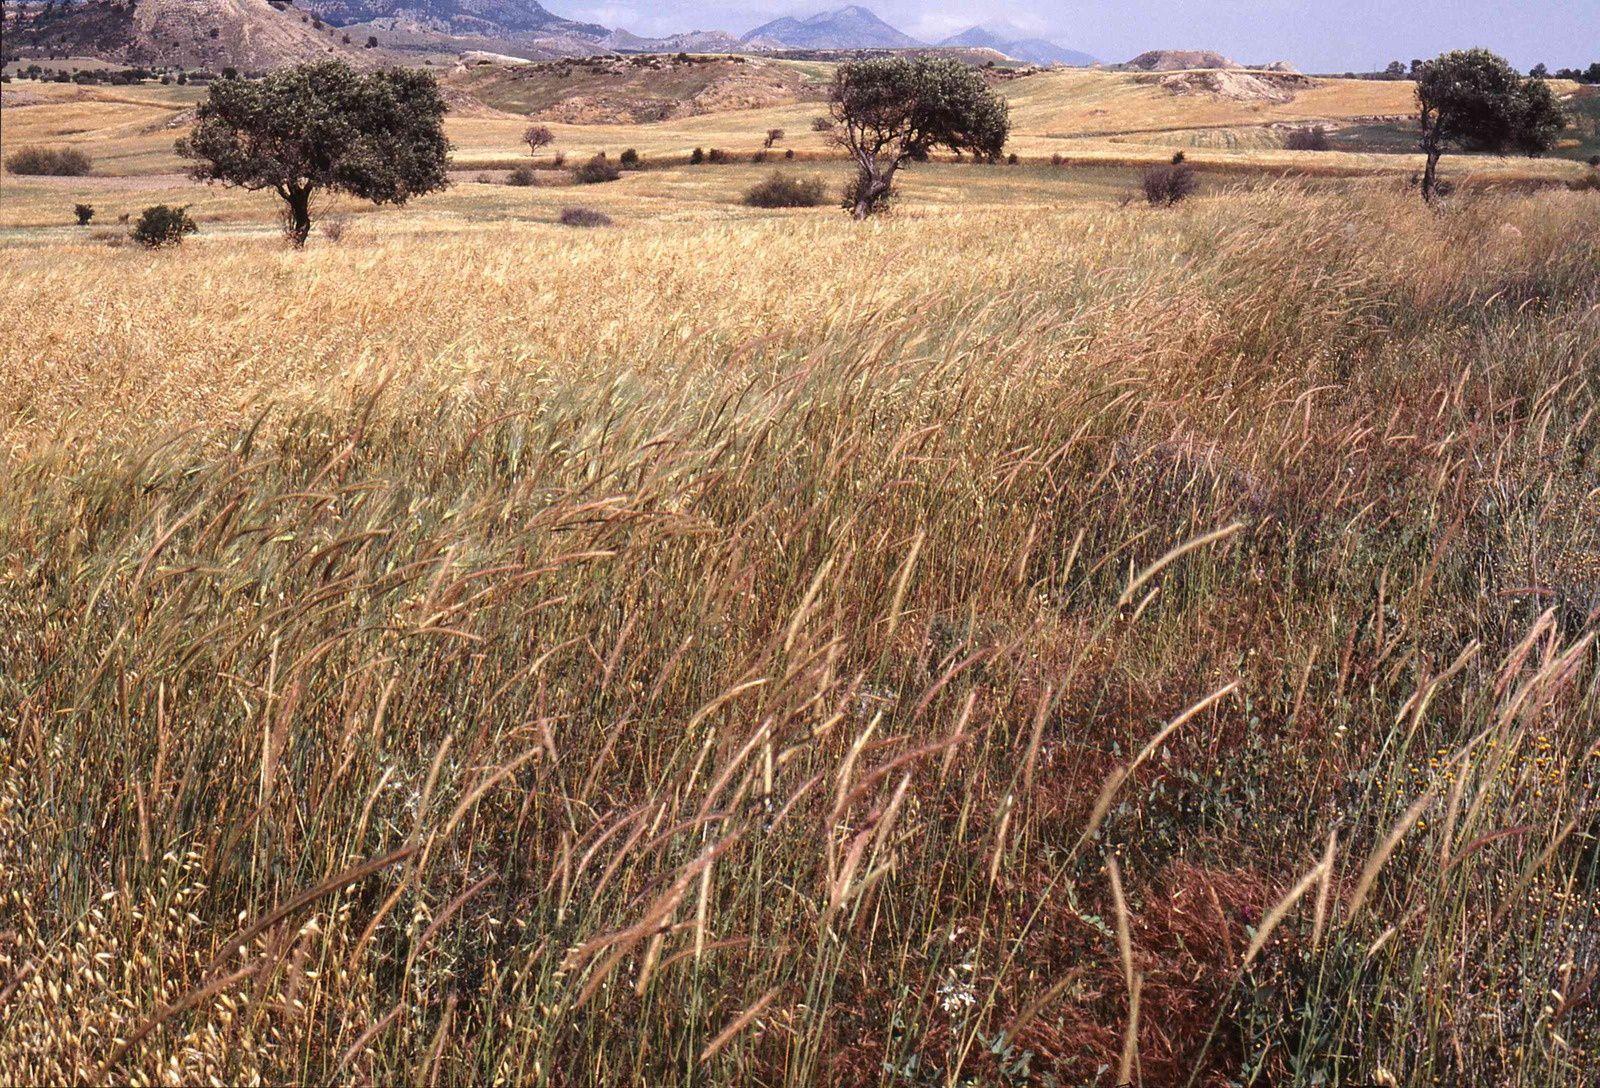 Paysage chypriote. Agios Ermolaos (Sirinevler) vers 2000. Photo E.C.